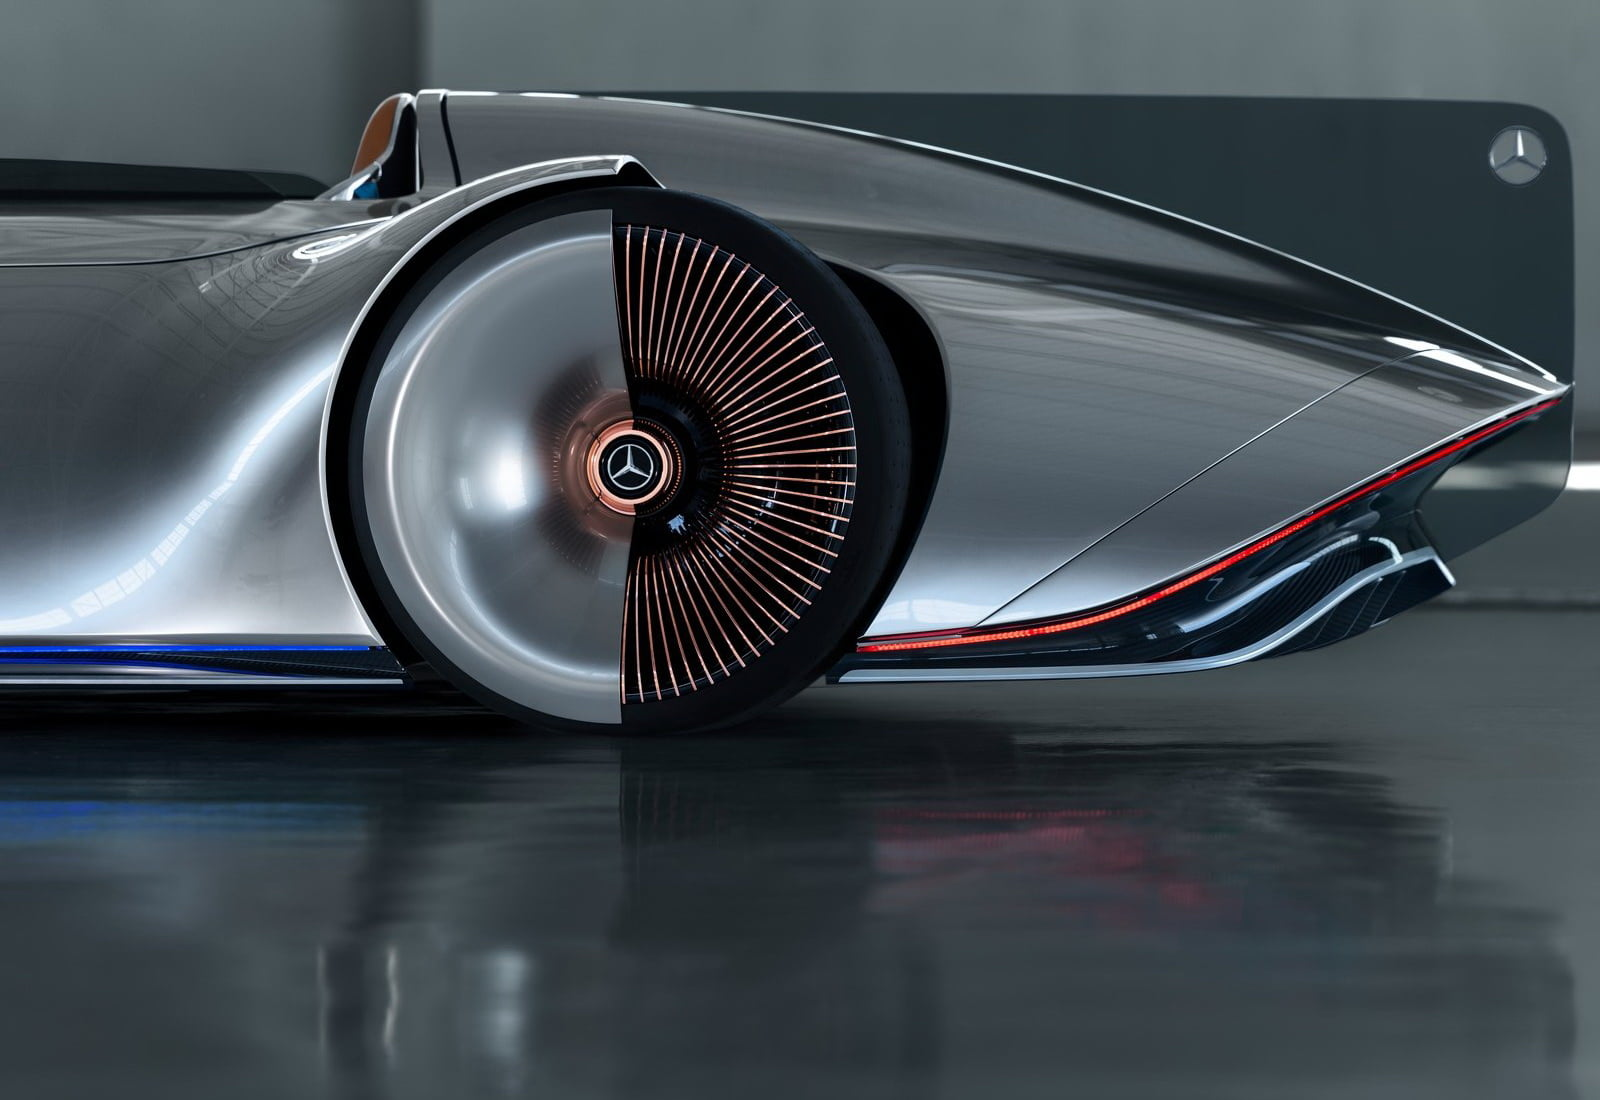 Hd Wallpaper 2018 Arrow Concept Mercedes Benz Silver Vision